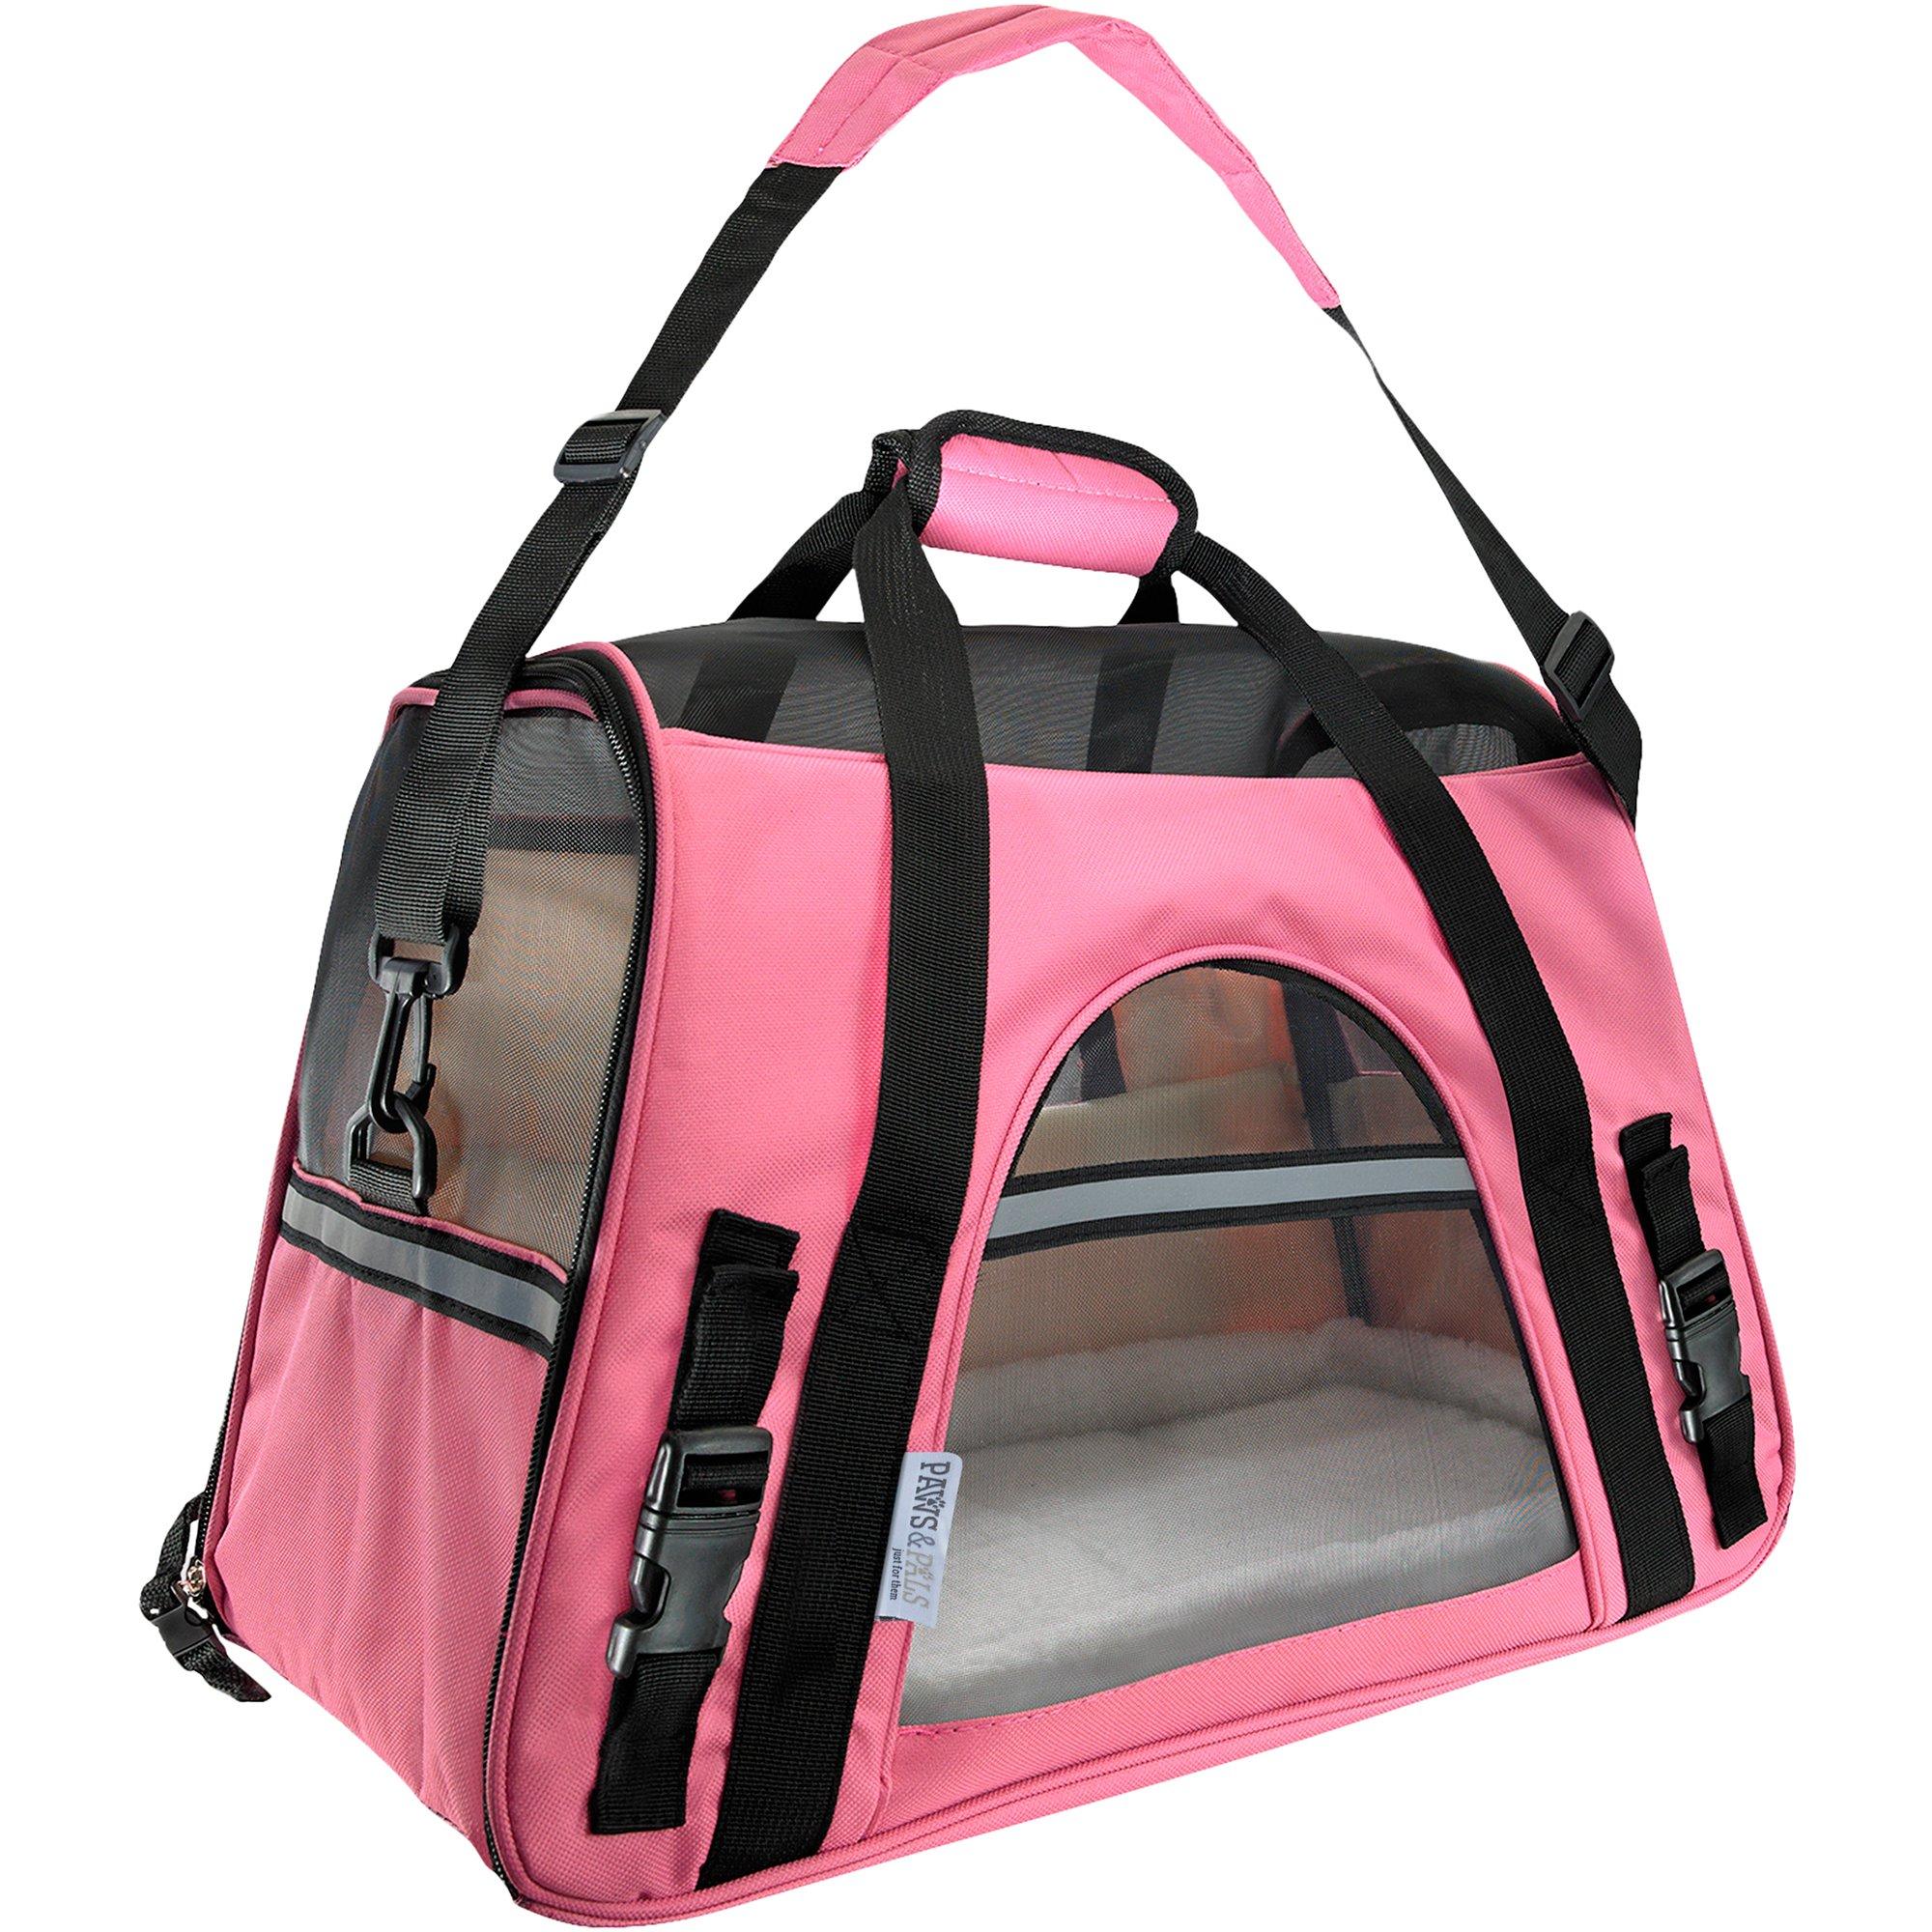 55a056713c Paws & Pals Pink Pet Carrier | Petco